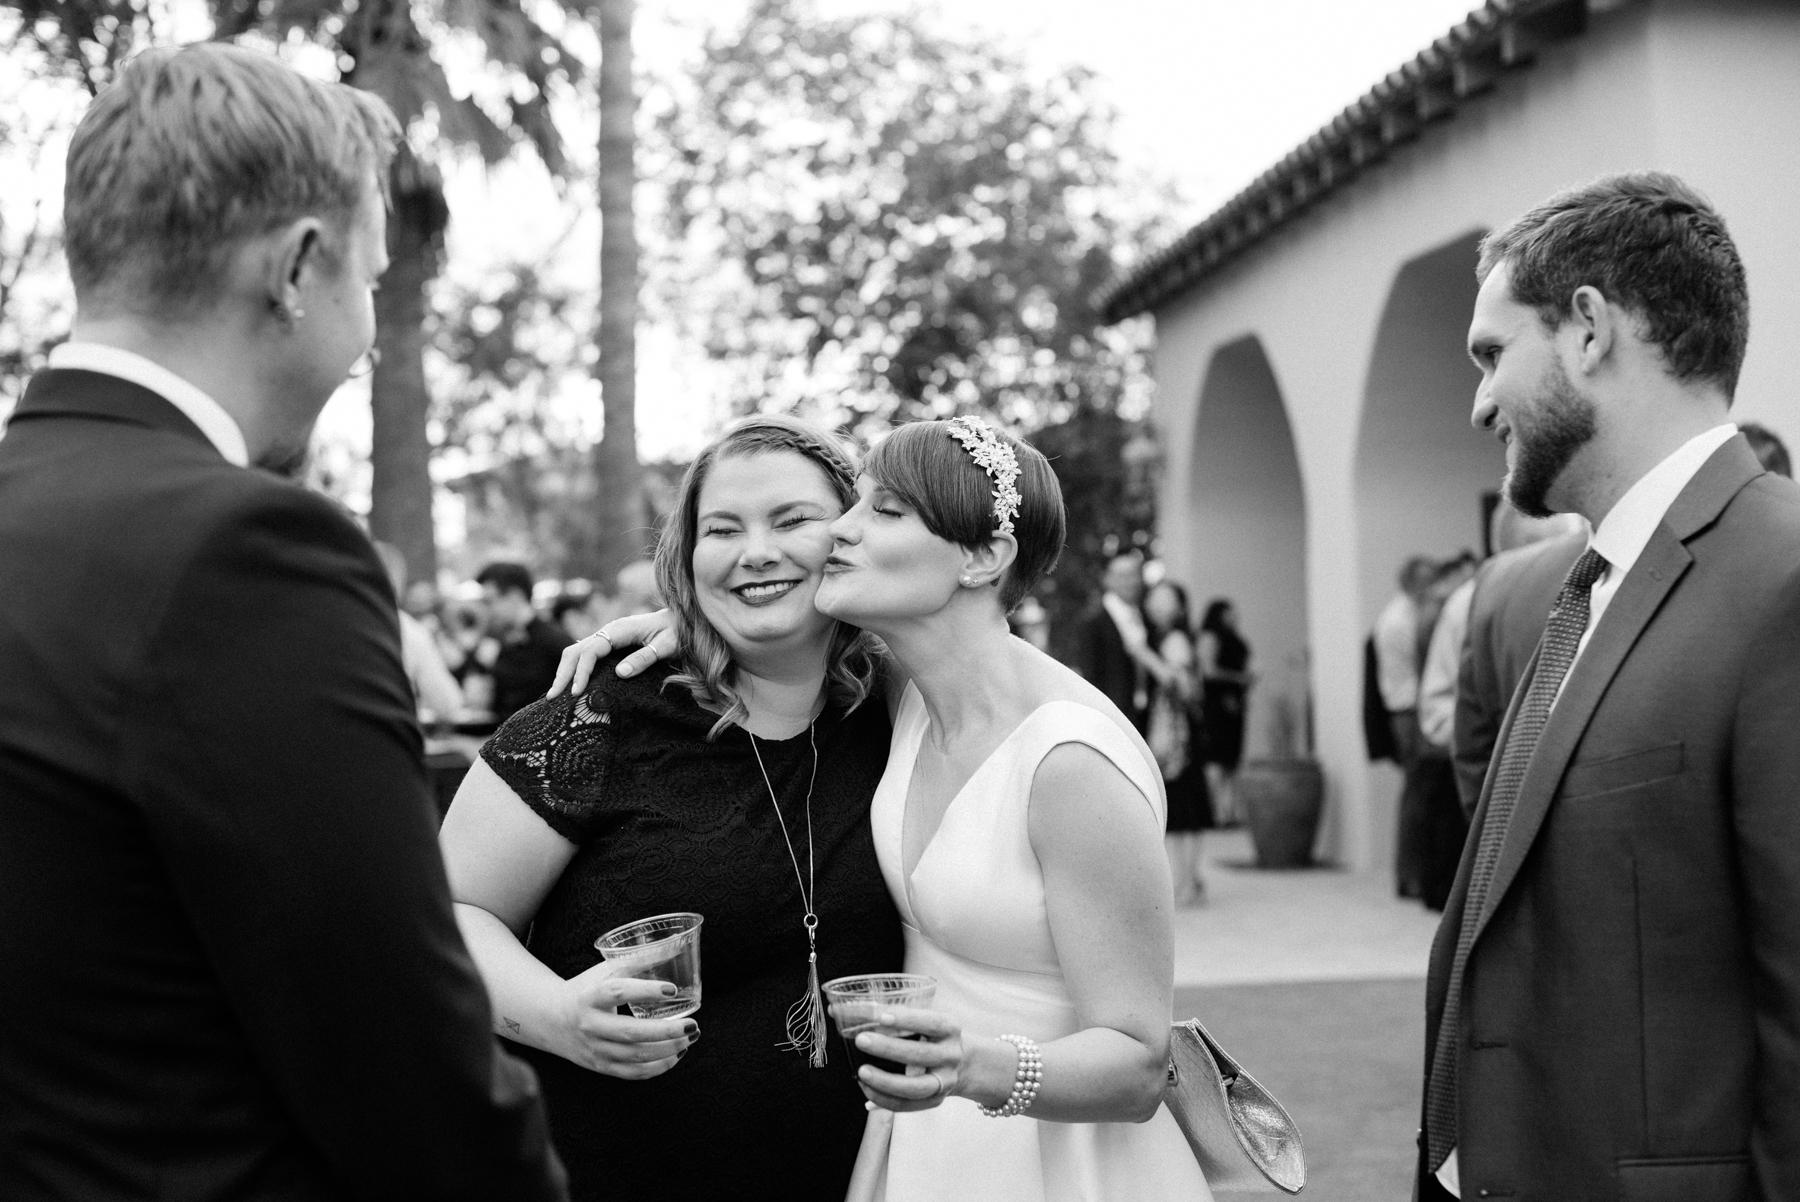 Secret Garden Event Center Wedding - Meredith Amadee Photography-2-5.jpg